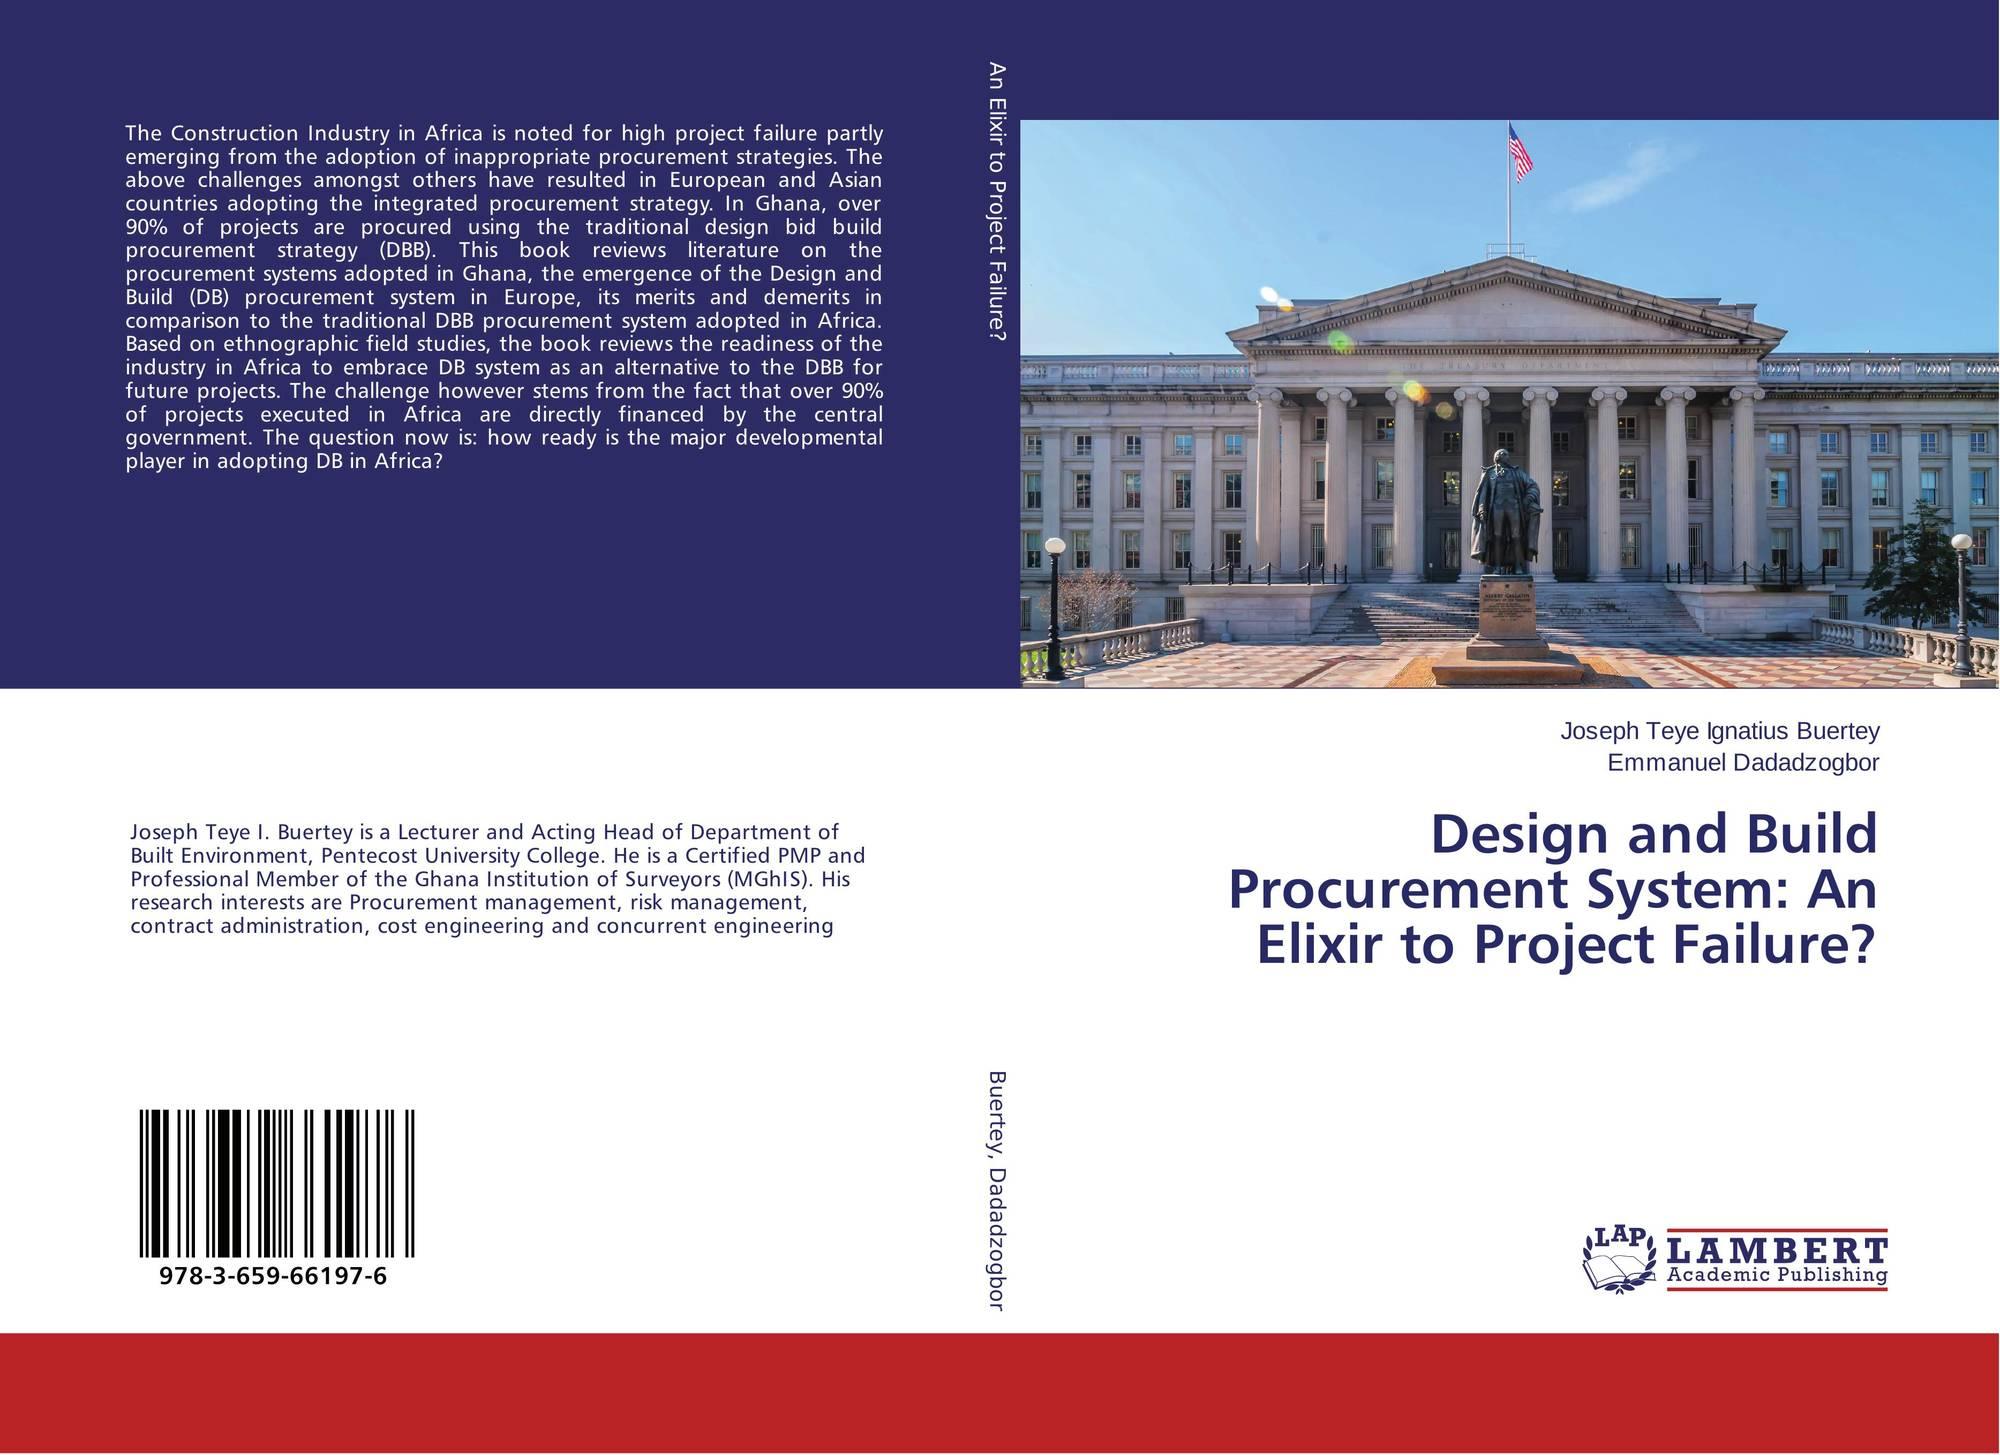 Design And Build Procurement System An Elixir To Project Failure 978 3 659 66197 6 365966197x 9783659661976 De Joseph Teye Ignatius Buertey Emmanuel Dadadzogbor